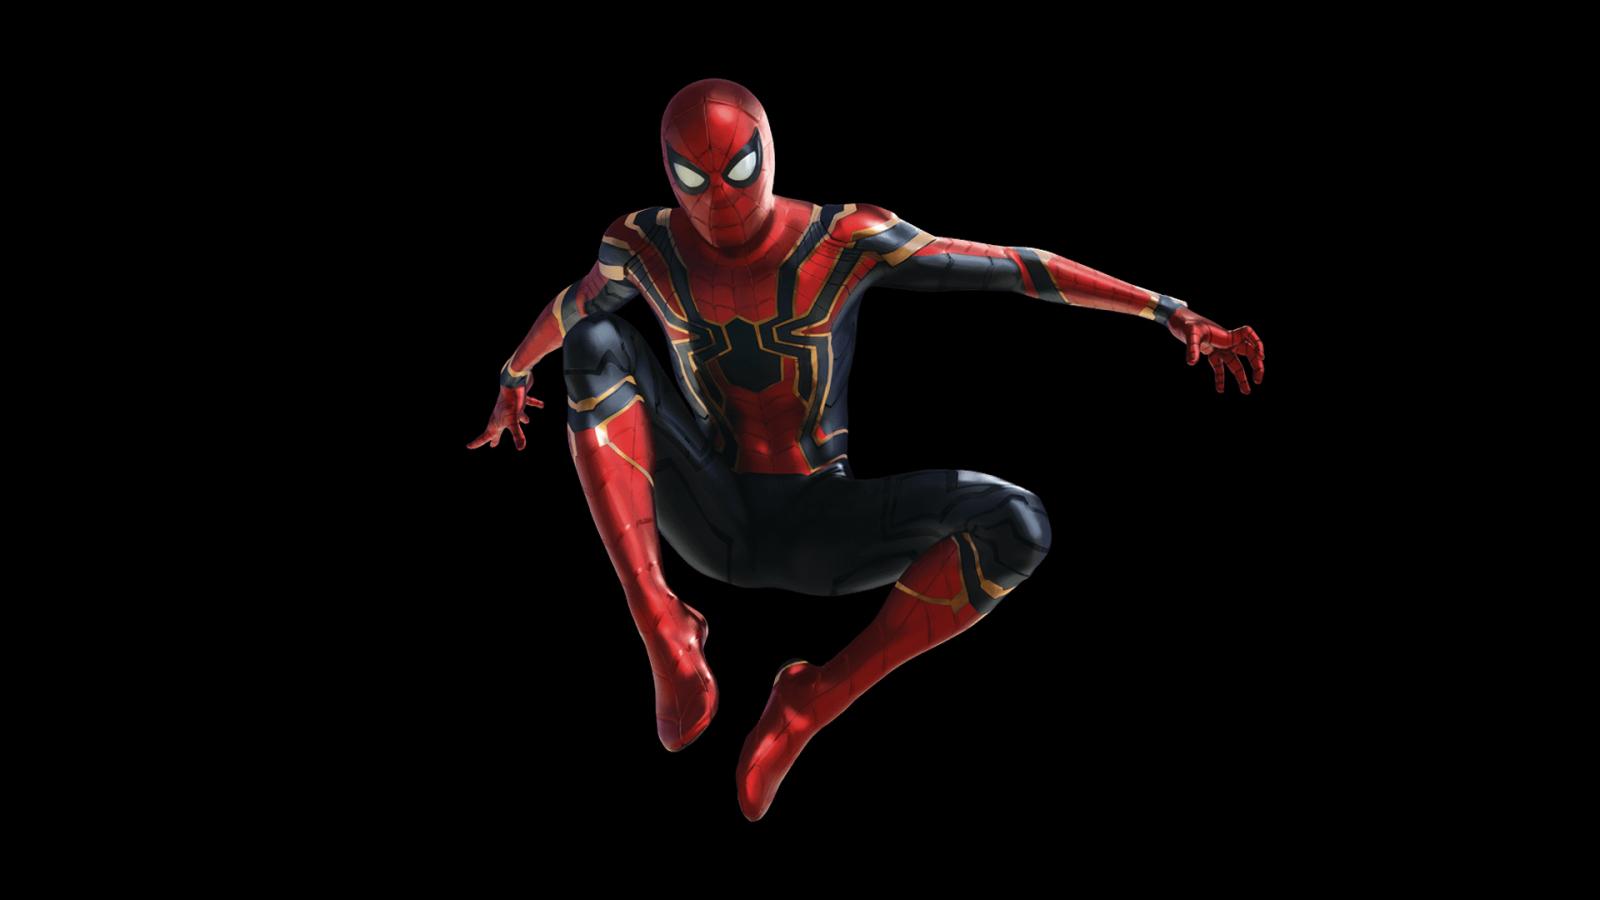 Spider Man In Avengers Infinity War, Full HD Wallpaper